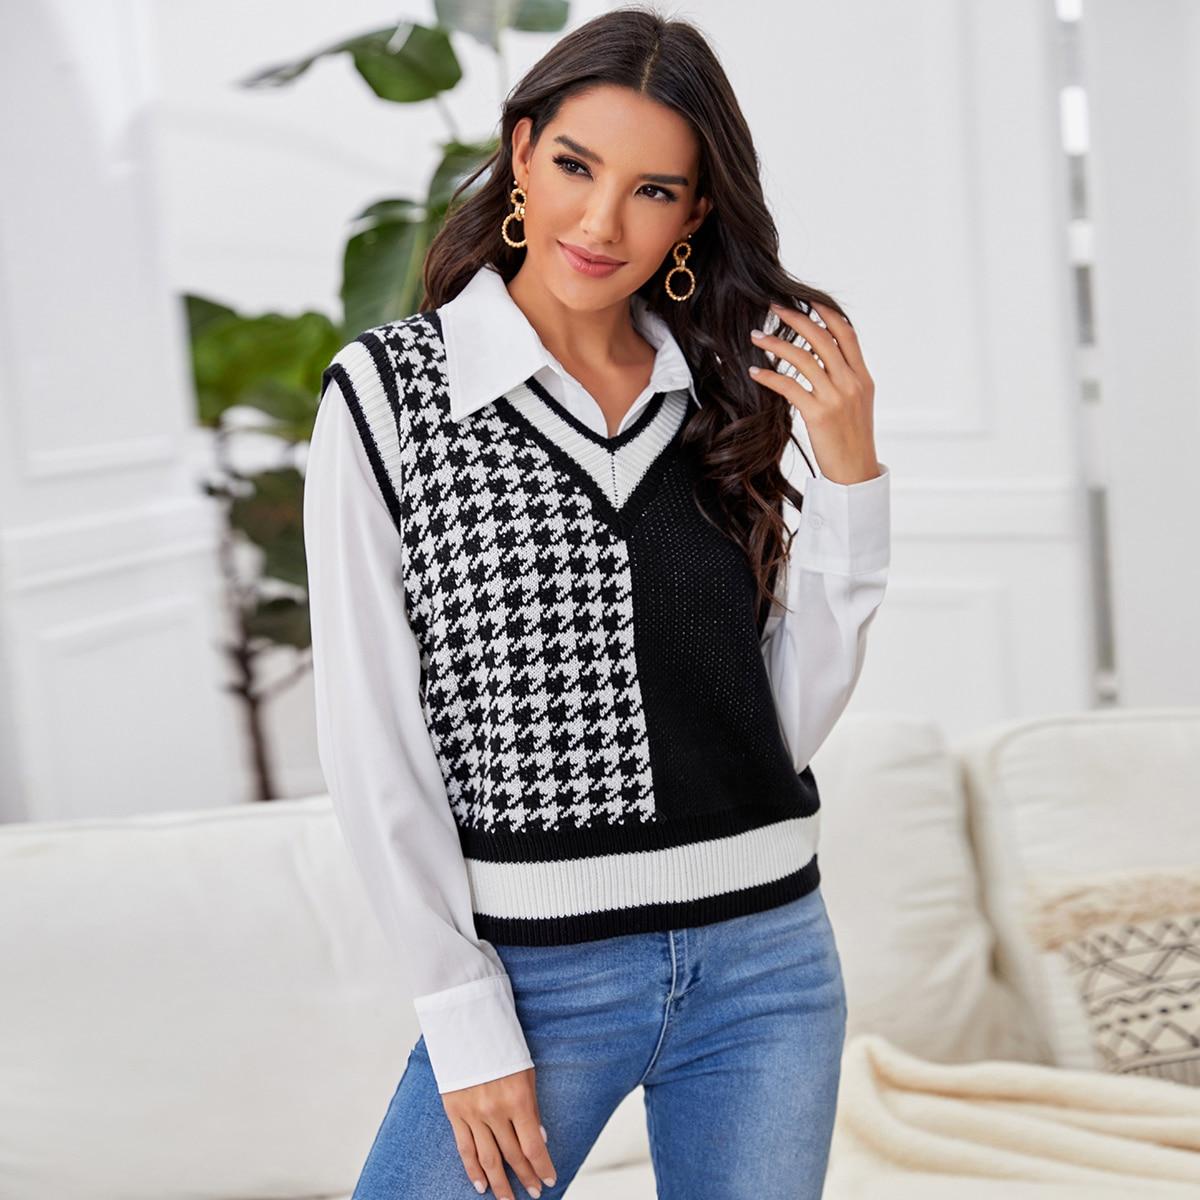 Striped Houndstooth Pattern Sweater Vest